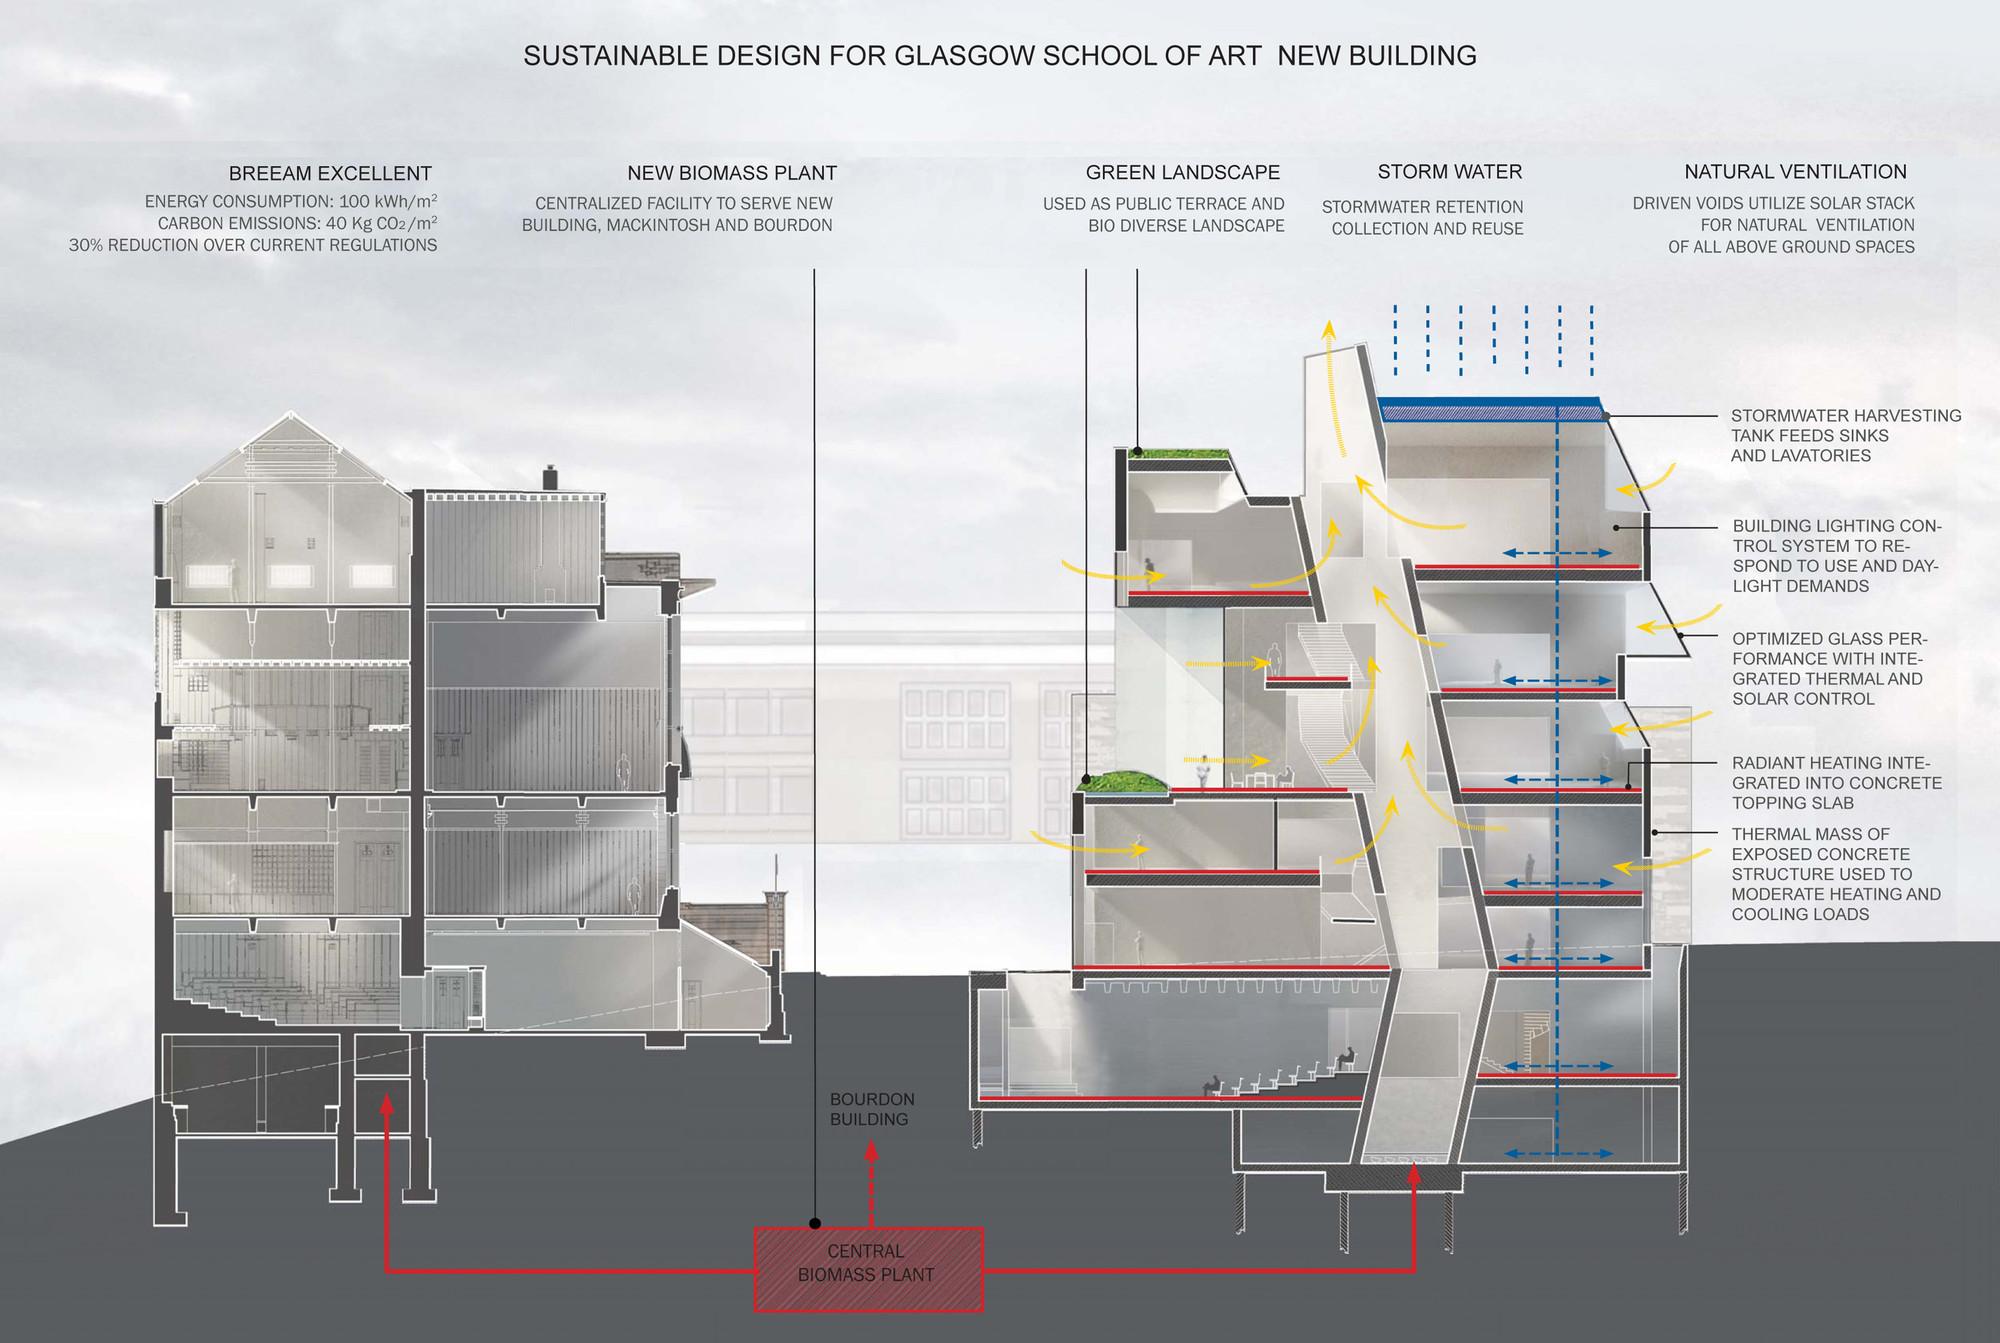 gallery of seona reid building steven holl architects 21. Black Bedroom Furniture Sets. Home Design Ideas